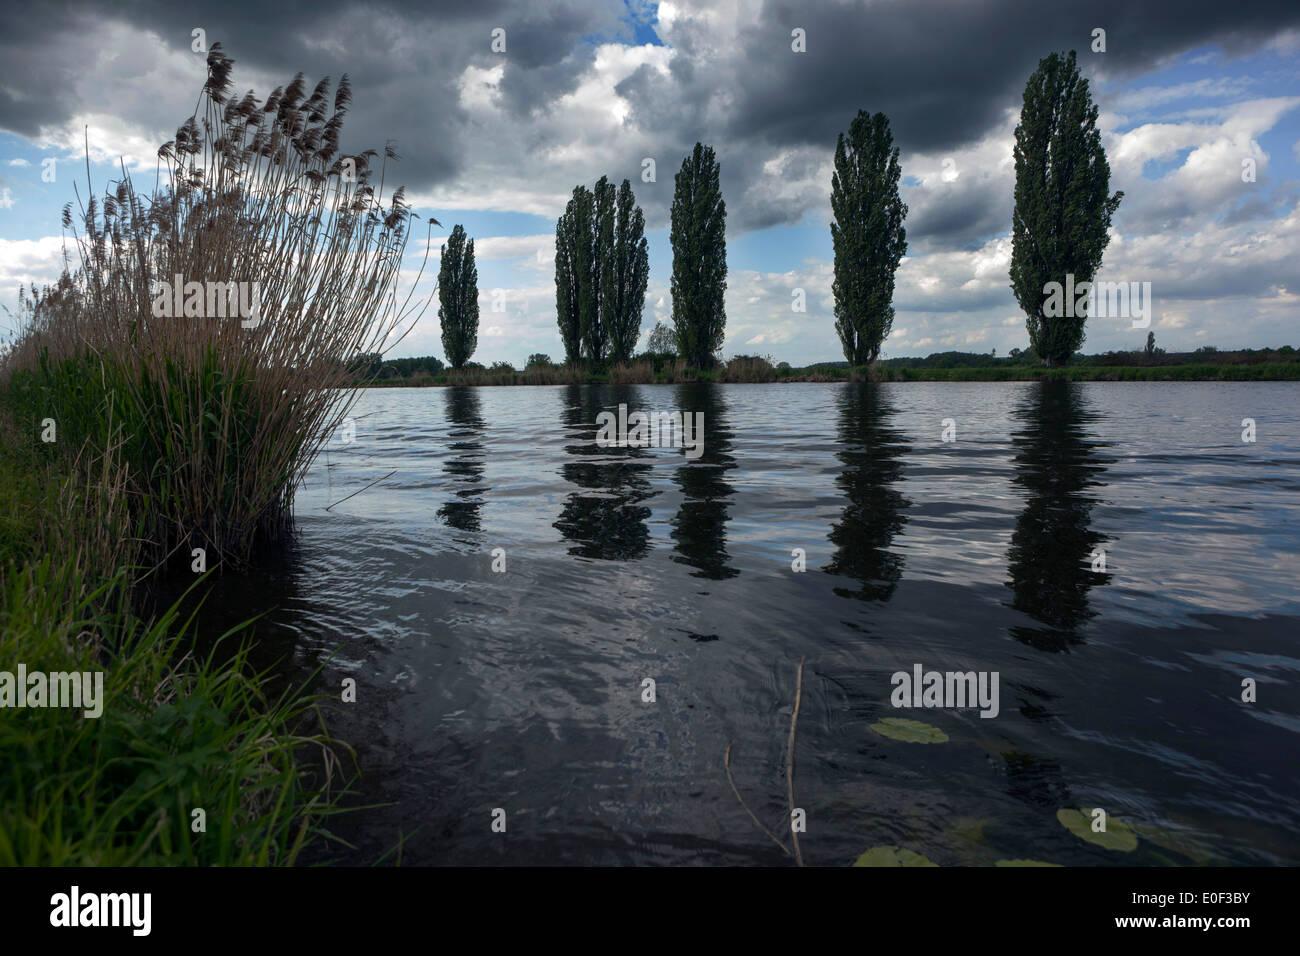 The river Elbe landscape - Stock Image